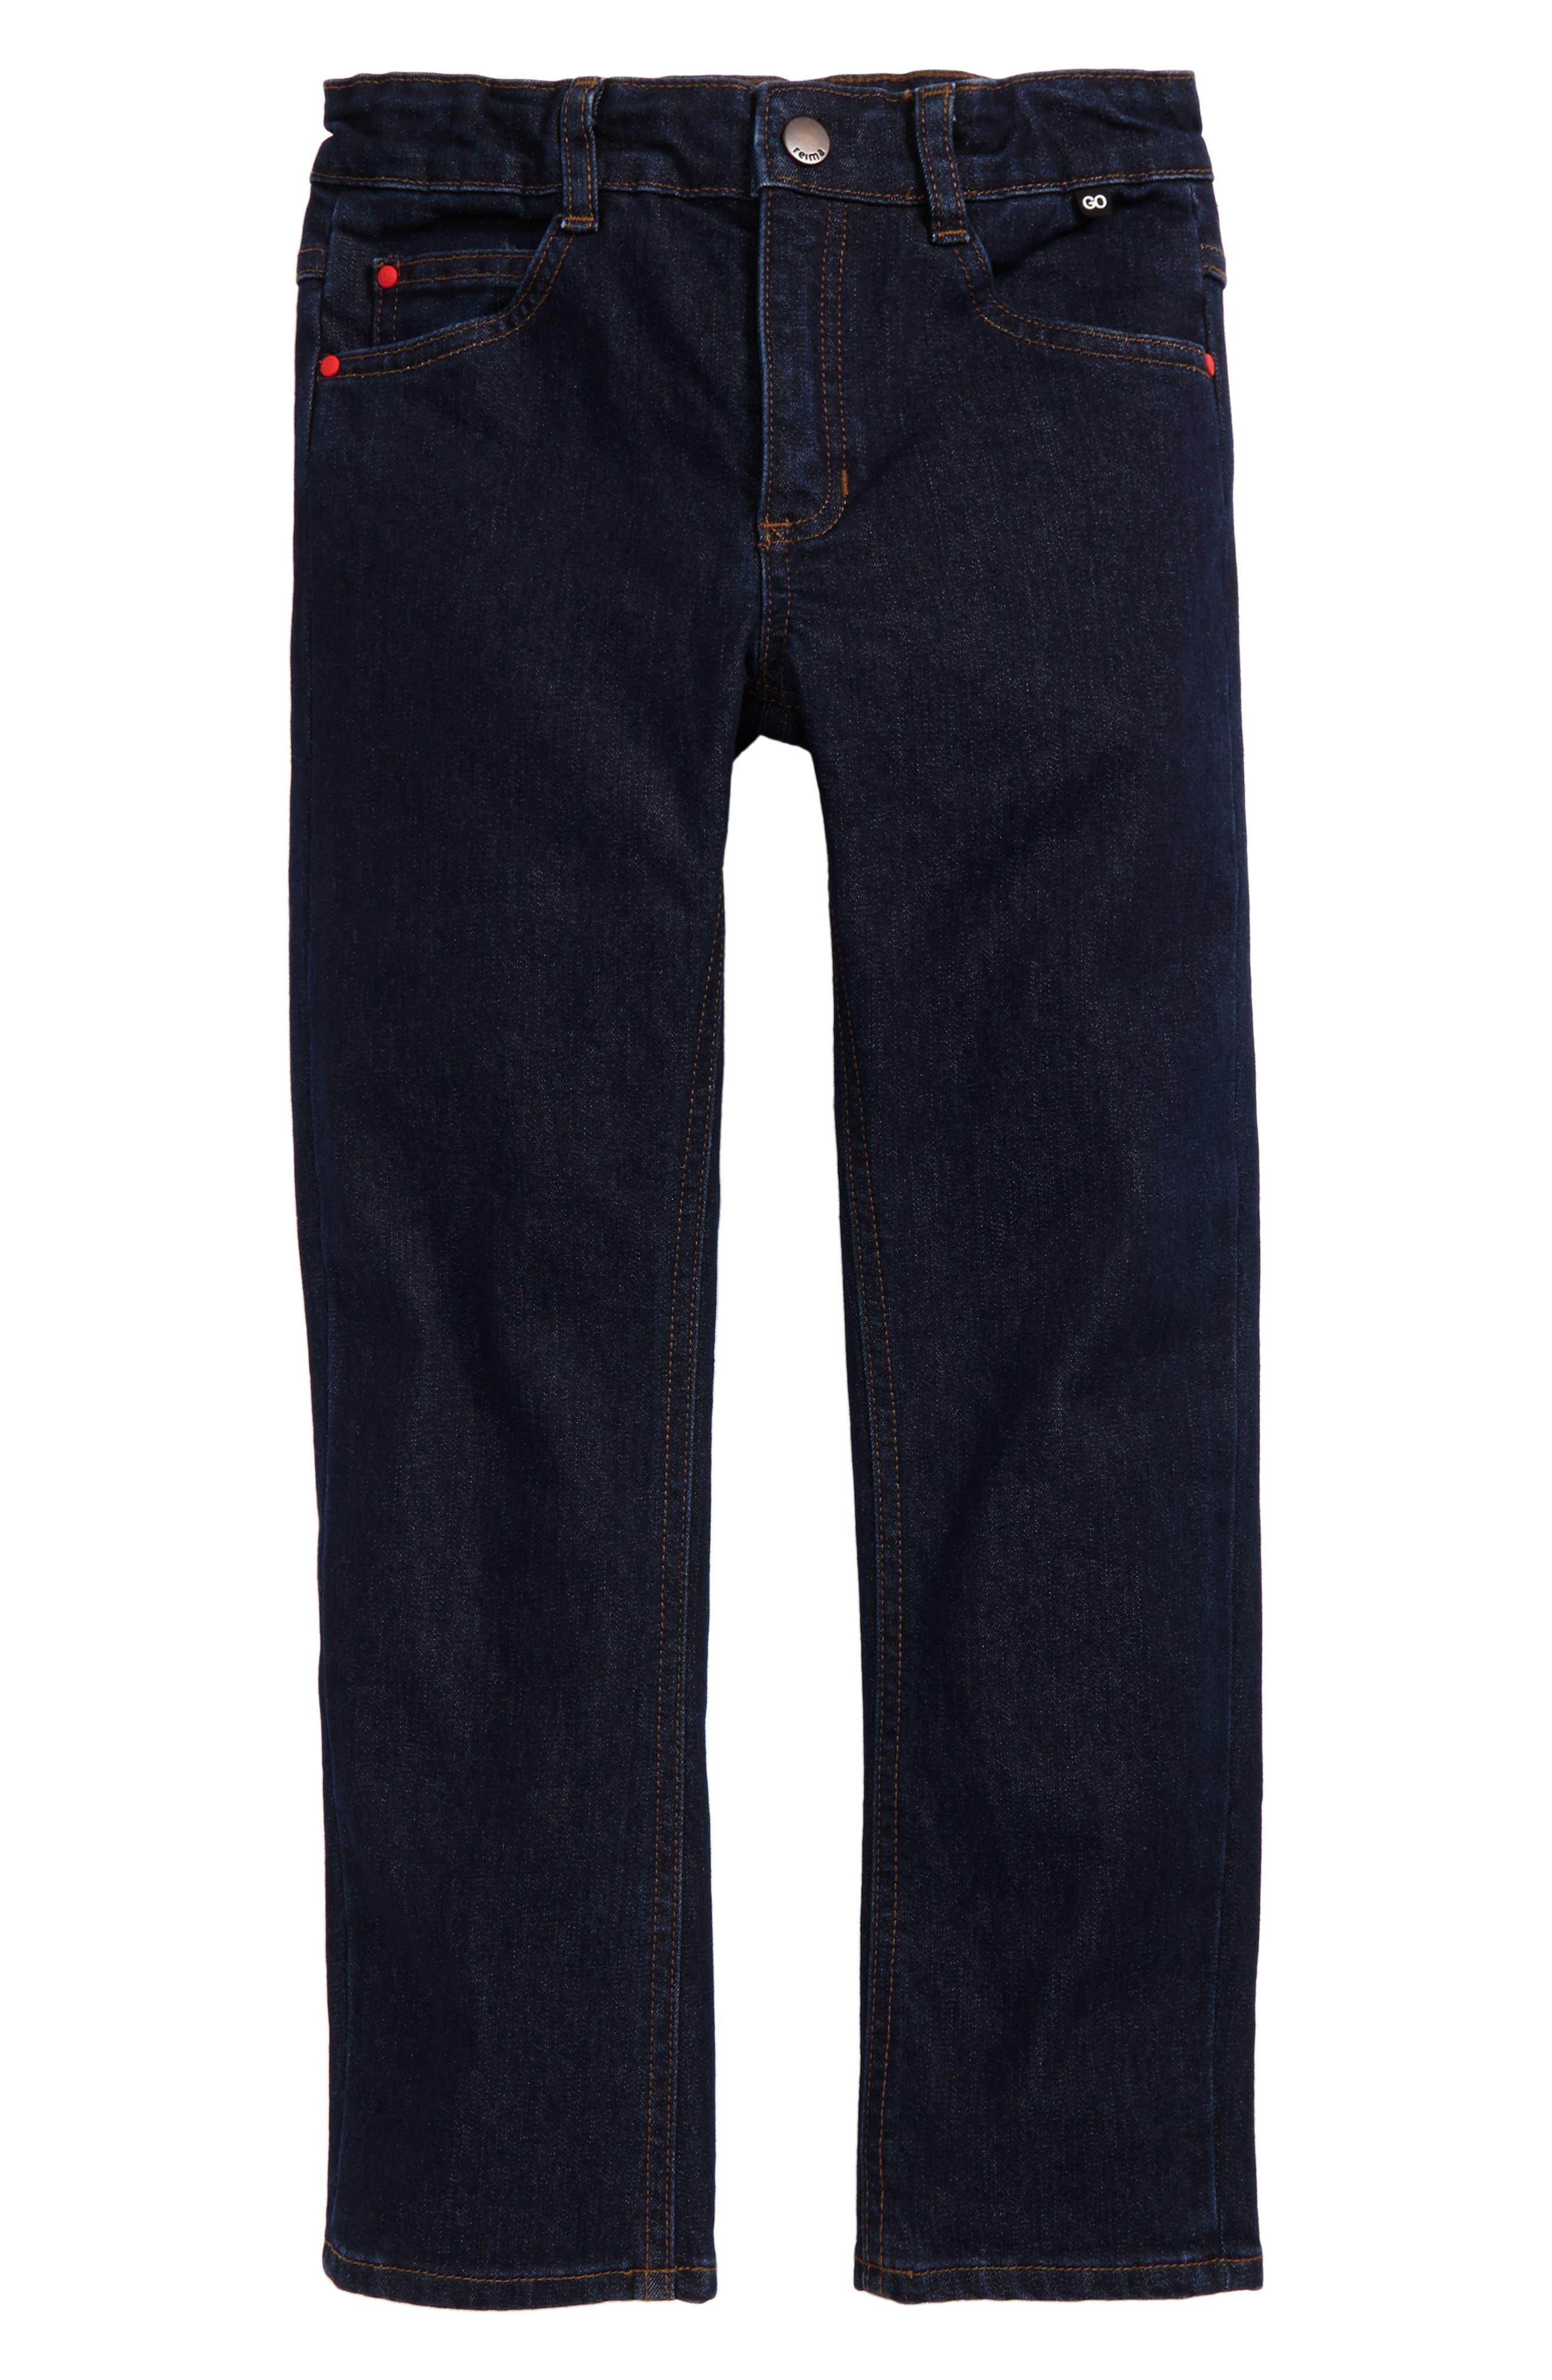 Trick Straight Leg Jeans,                             Main thumbnail 1, color,                             400